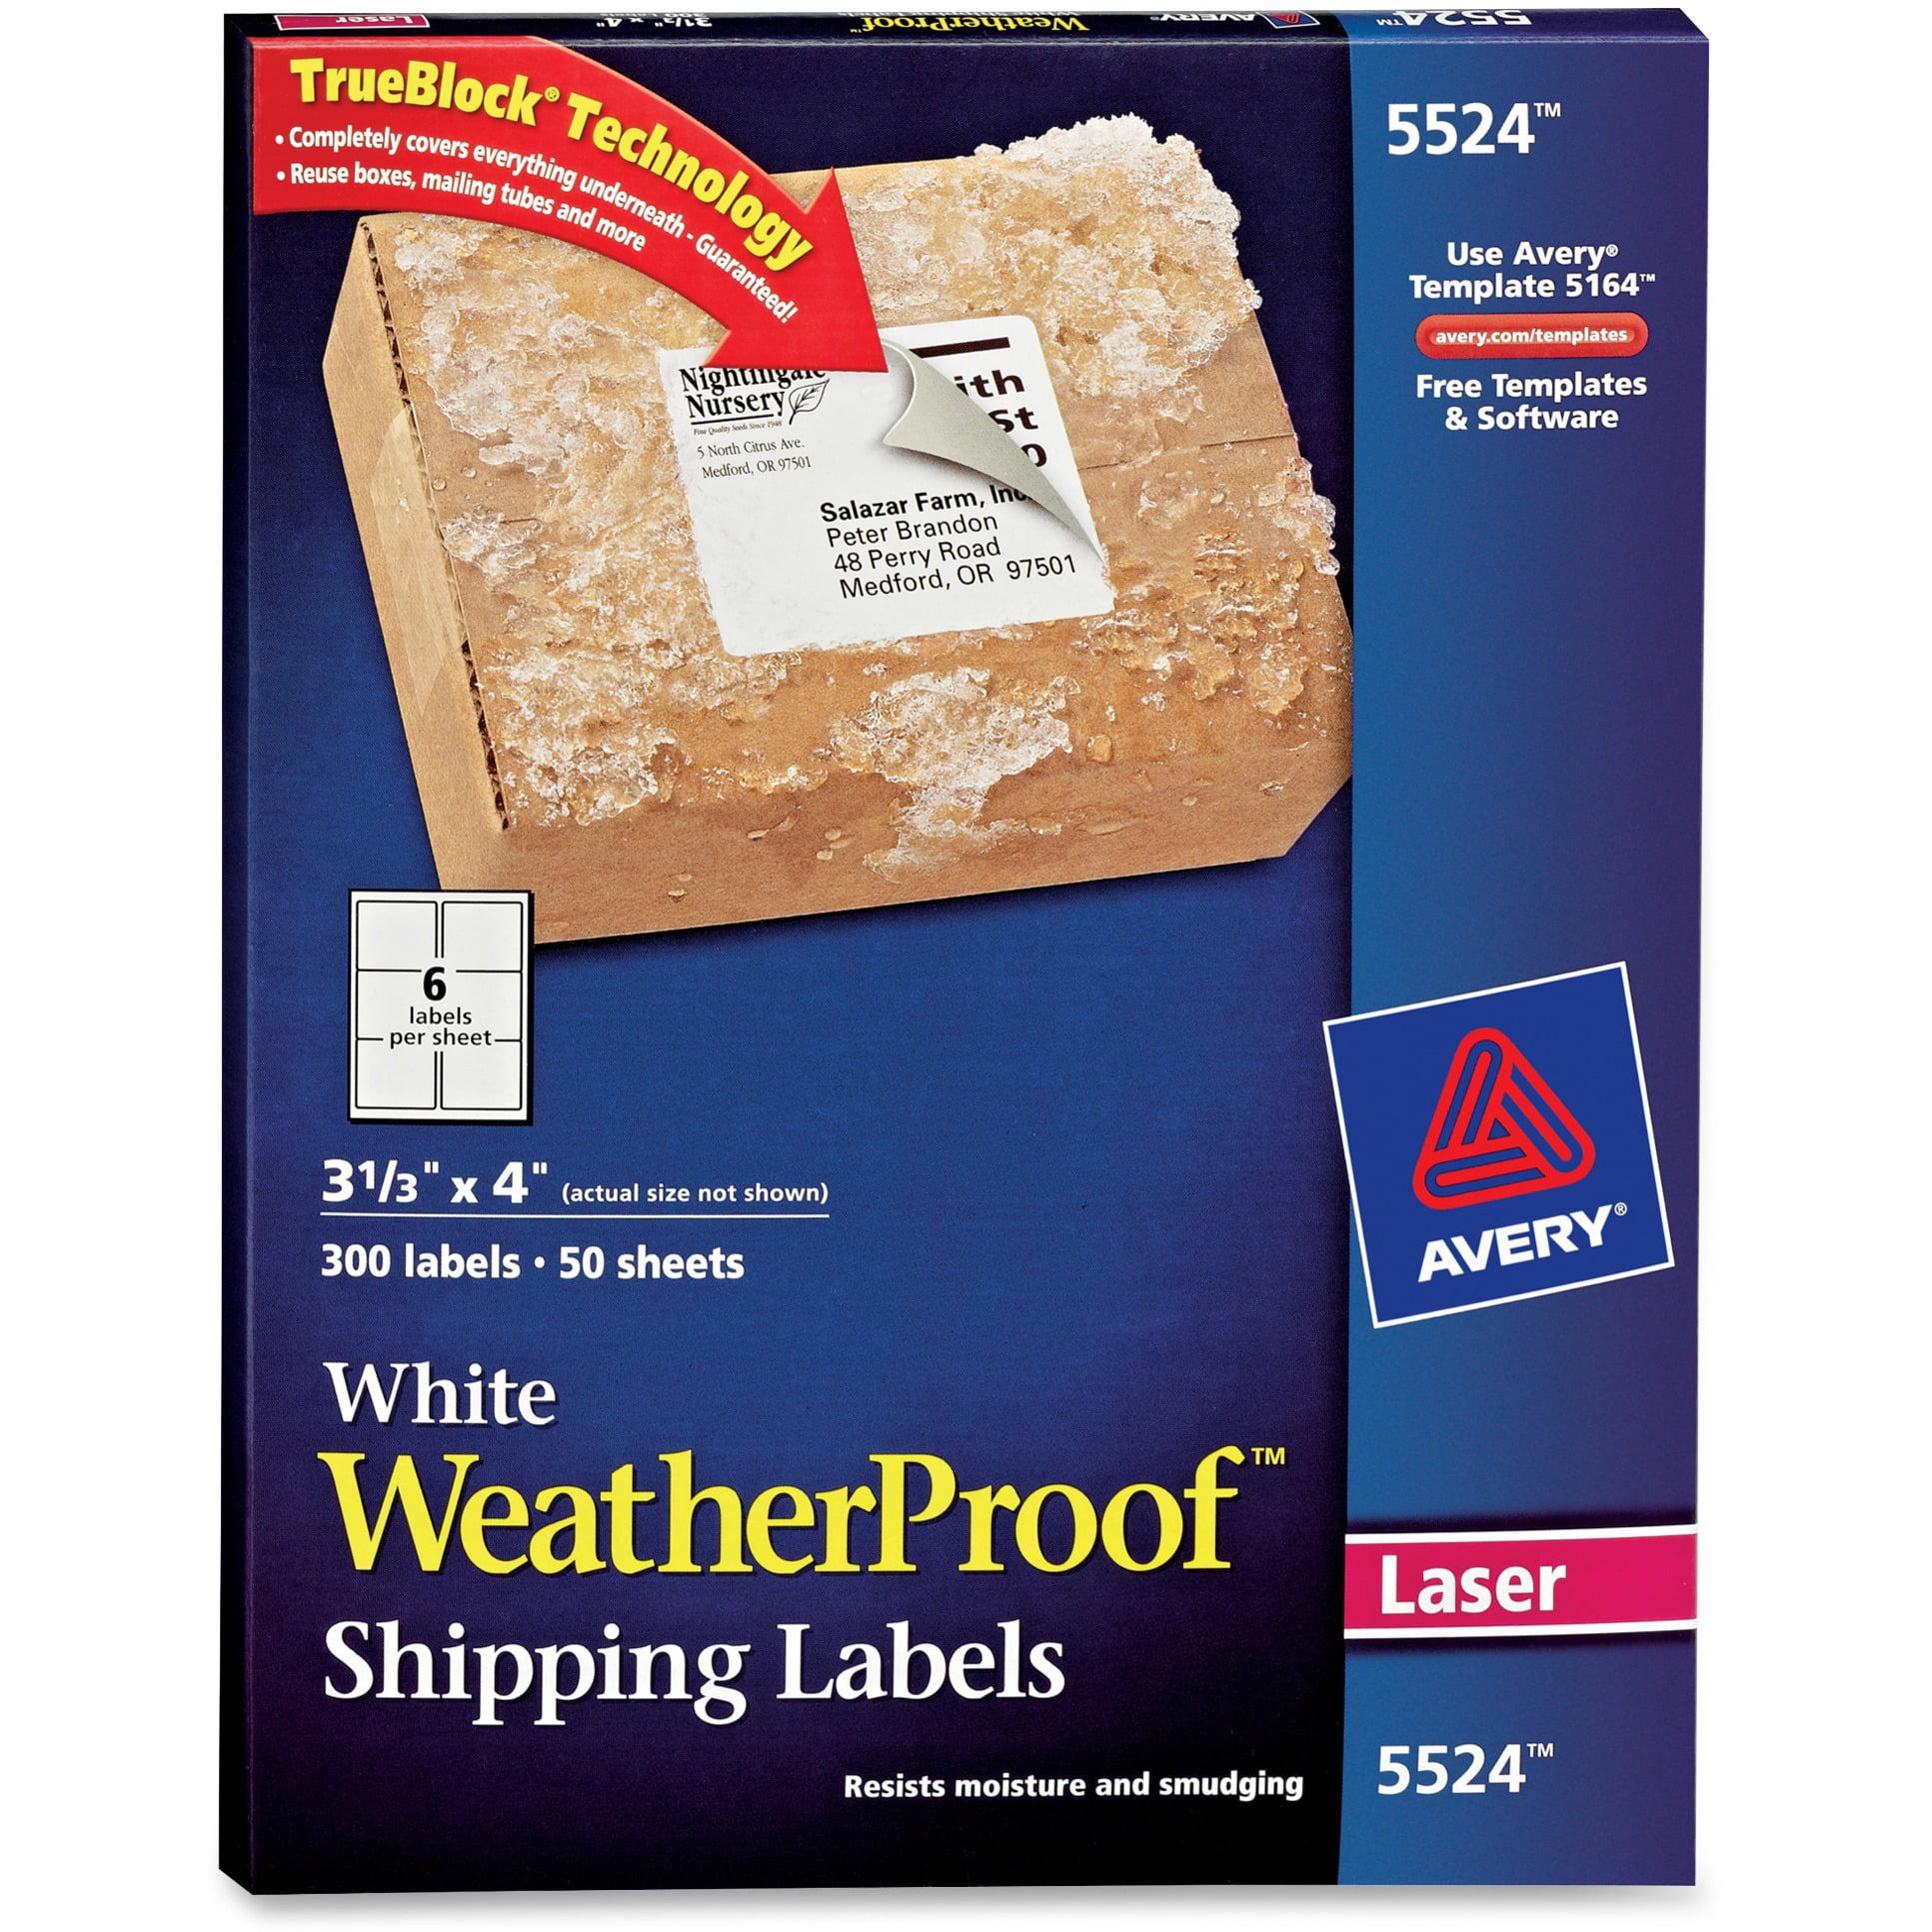 Avery WeatherProof Shipping Labels w/TrueBlock, Laser, White, 3 1/3 x 4, 300/Pack